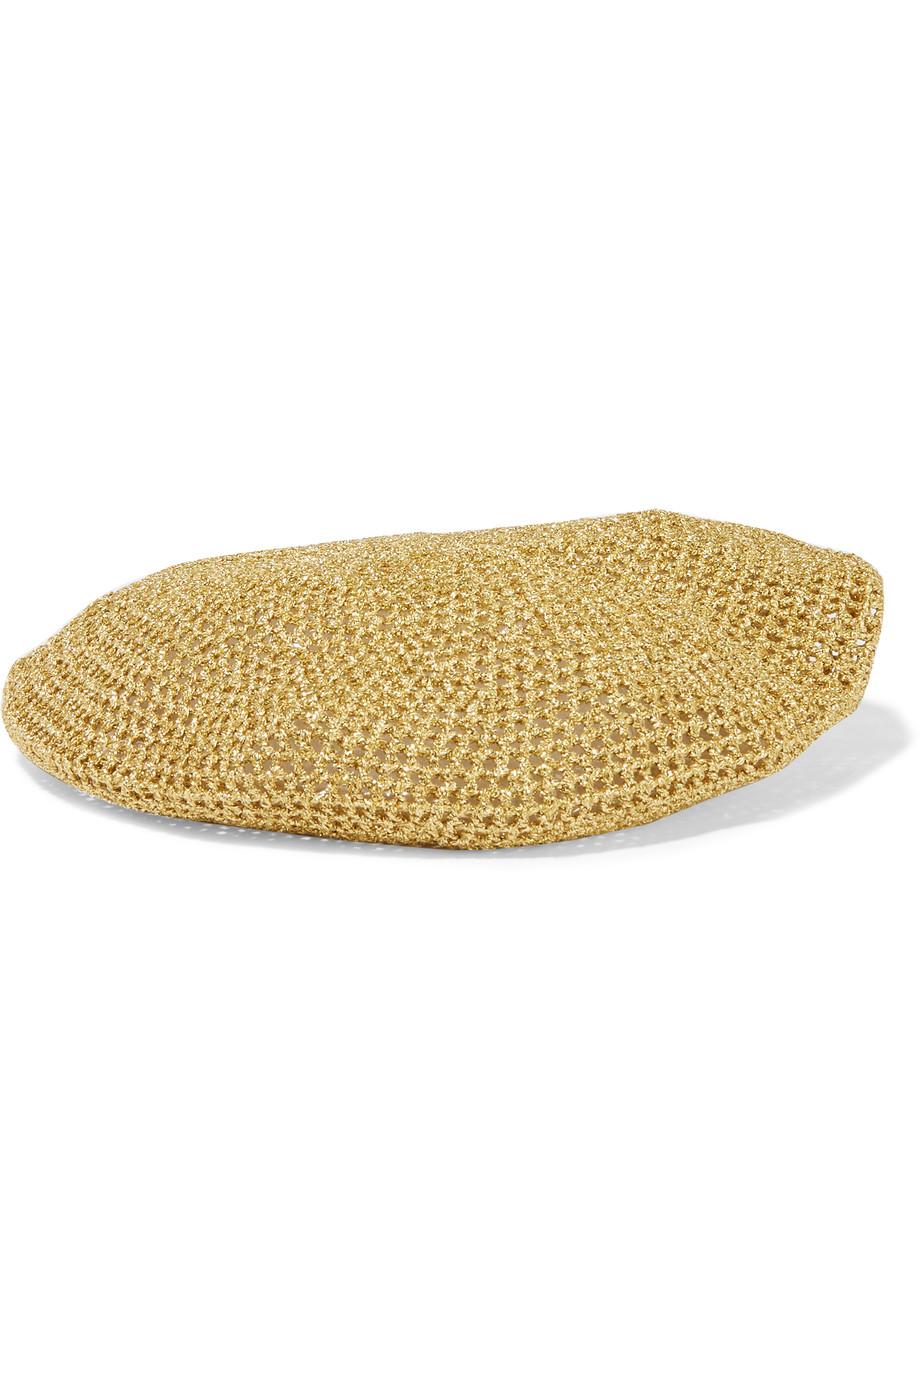 Gucci Thelma Metallic Crochet-Knit Beret